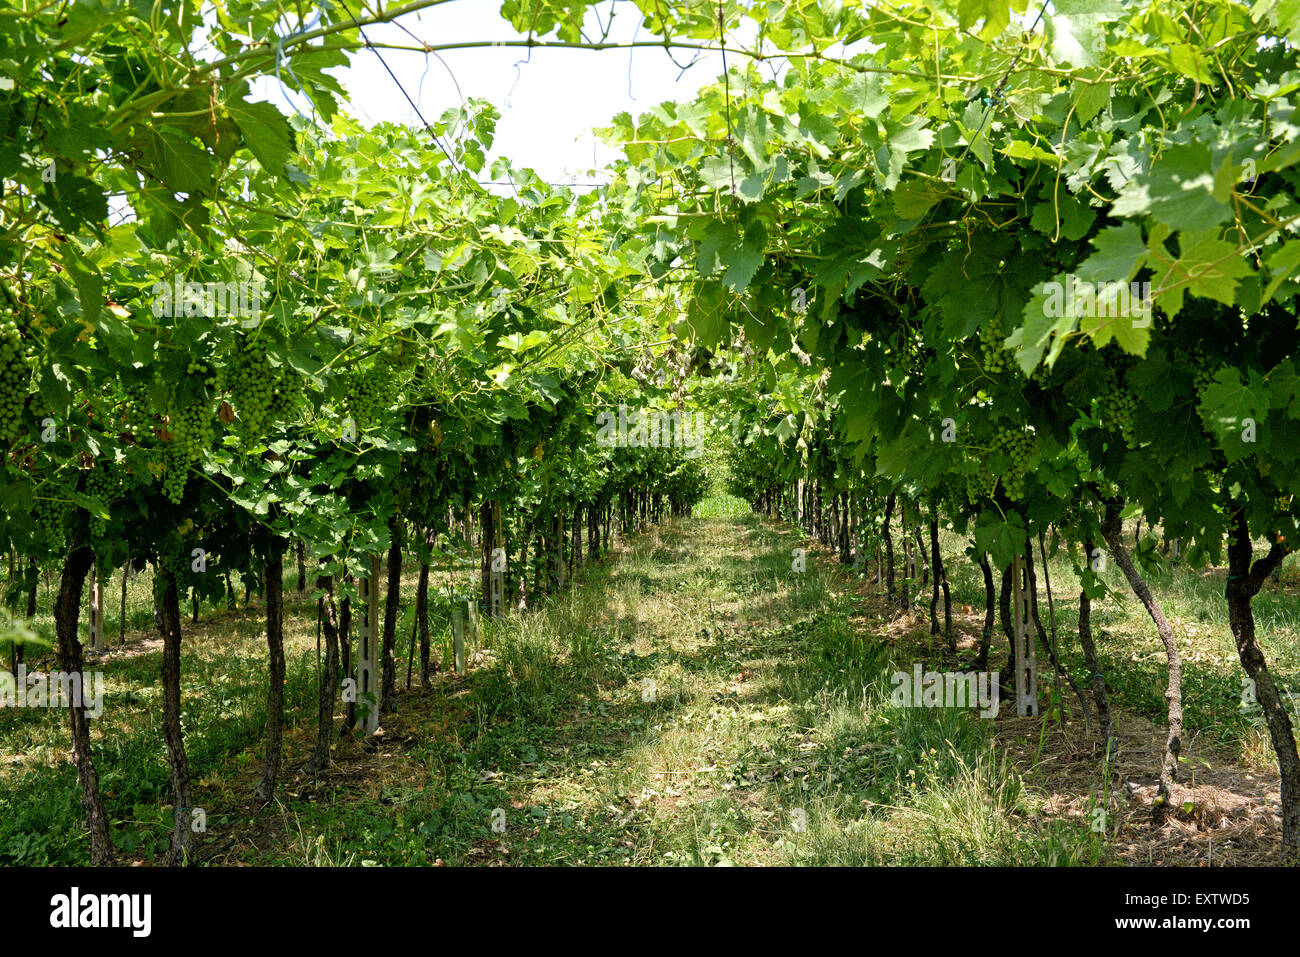 Rows of trellised vines in a vineyard - Stock Image